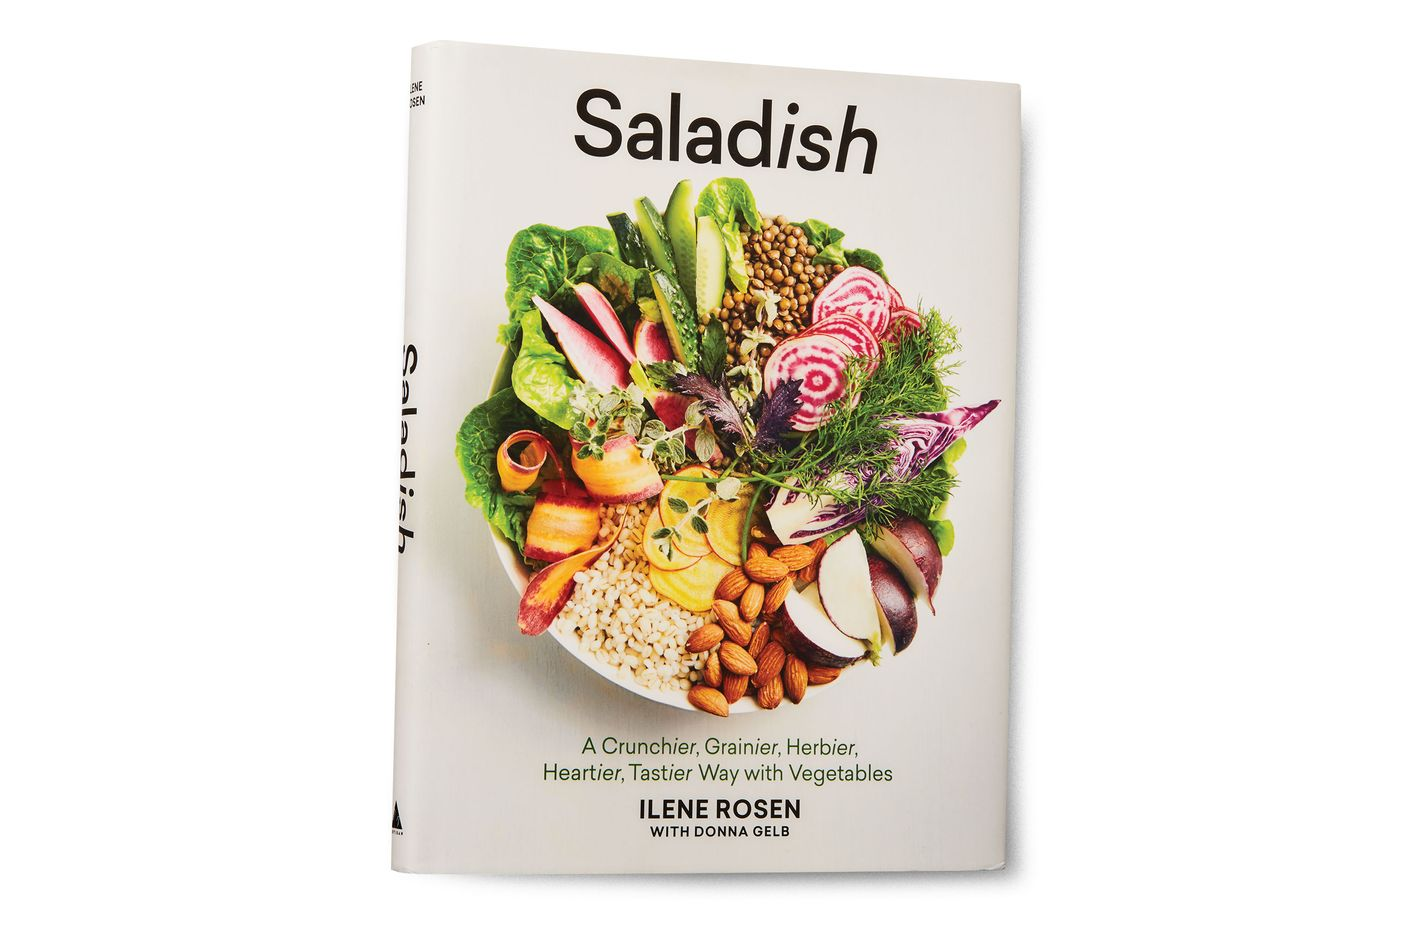 Saladish: A Crunchier, Grainier, Herbier, Heartier, Tastier Way With Vegetables